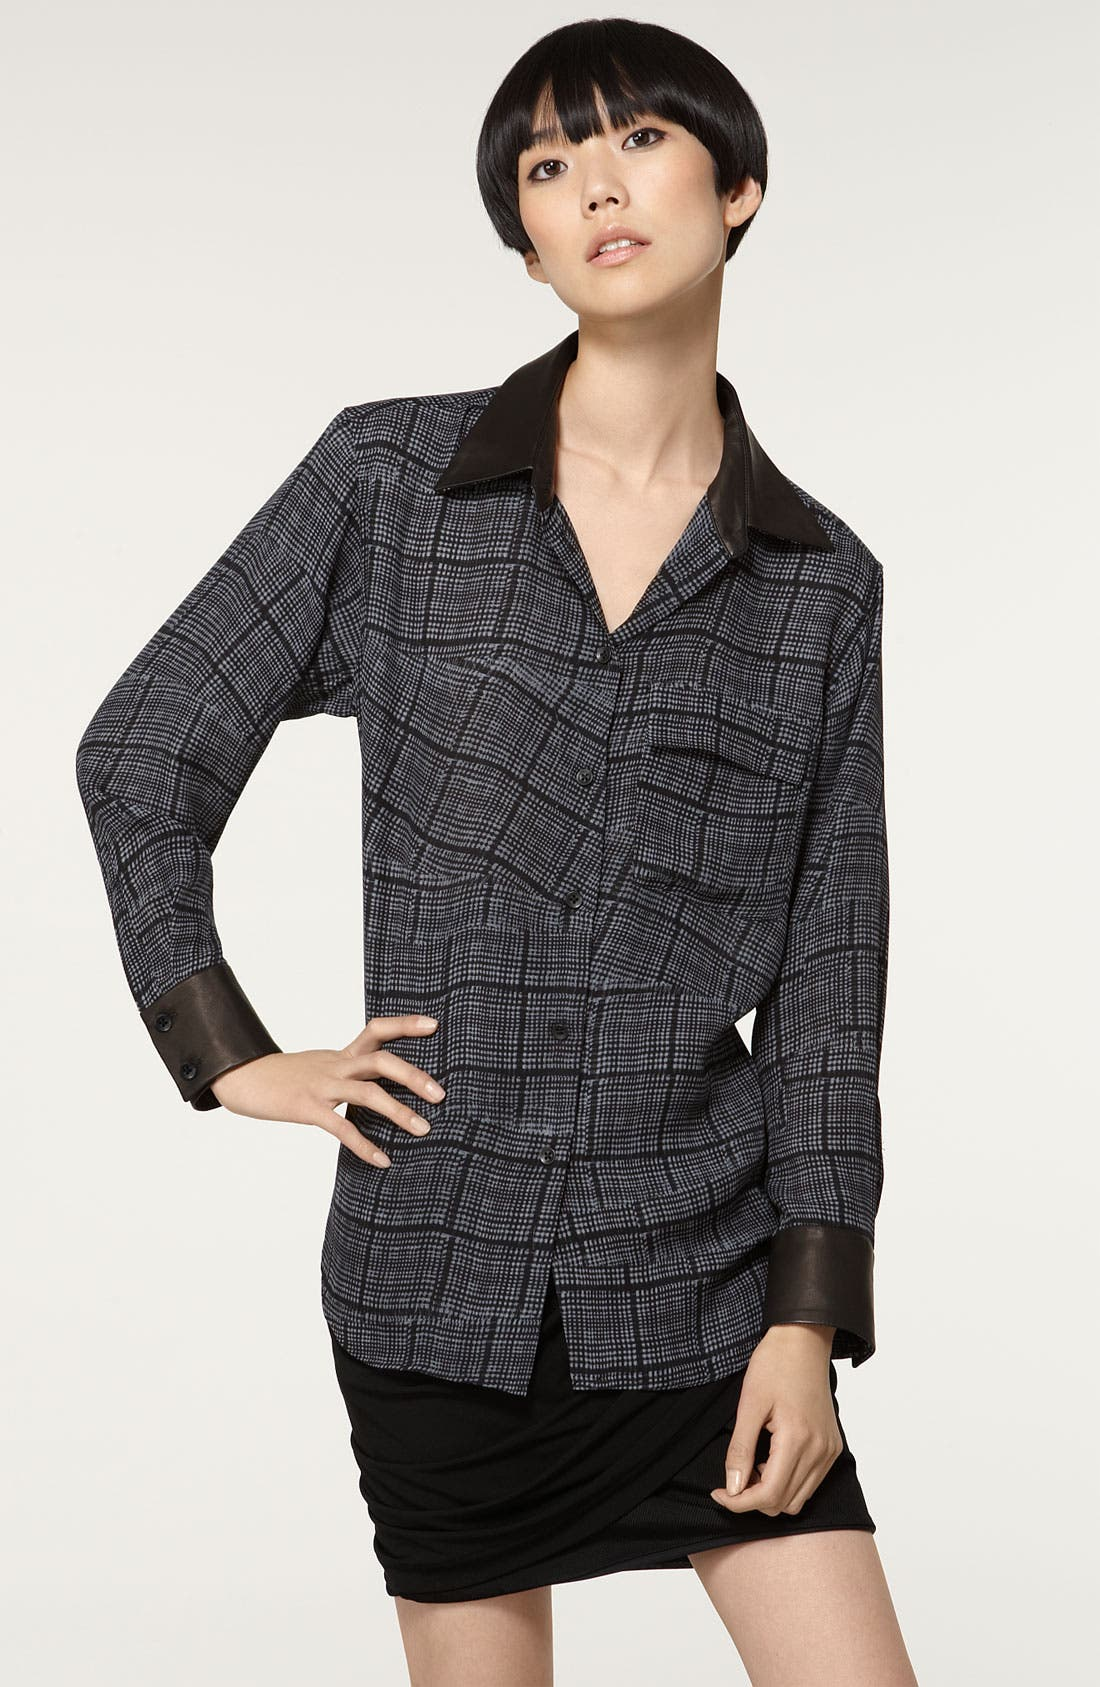 Main Image - Rag & Bone 'Marais' Lambskin Leather Trim Silk Shirt